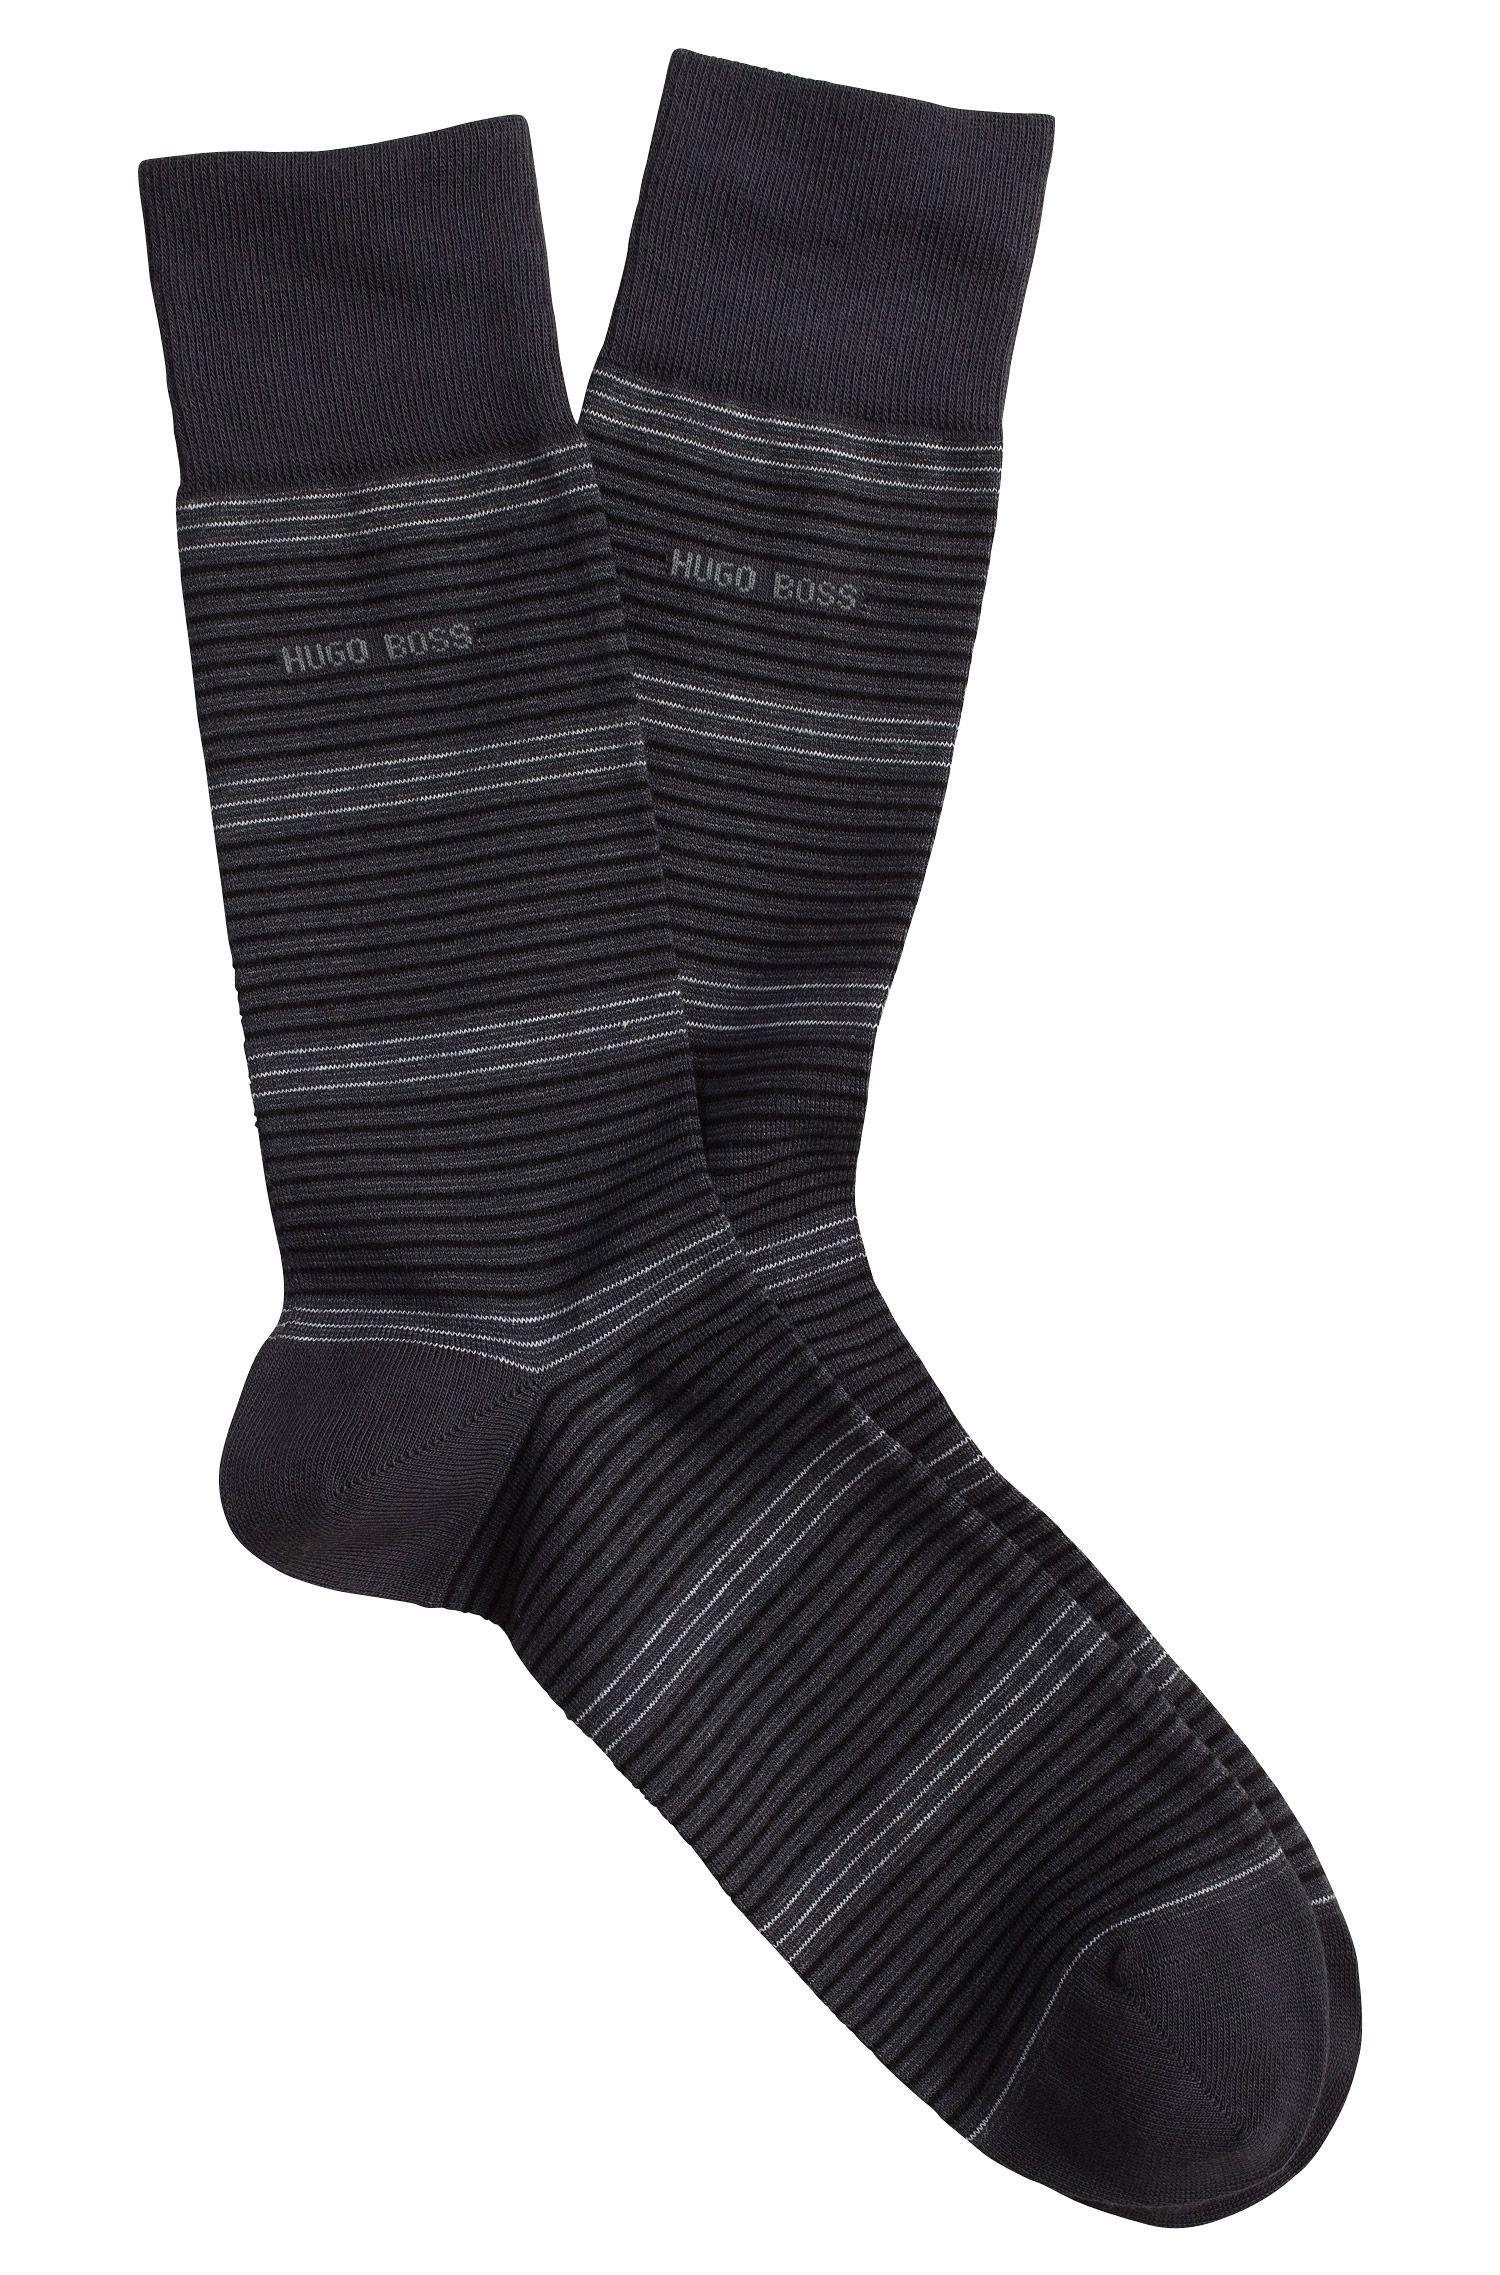 Socken ´RS Design` aus Baumwoll-Mix